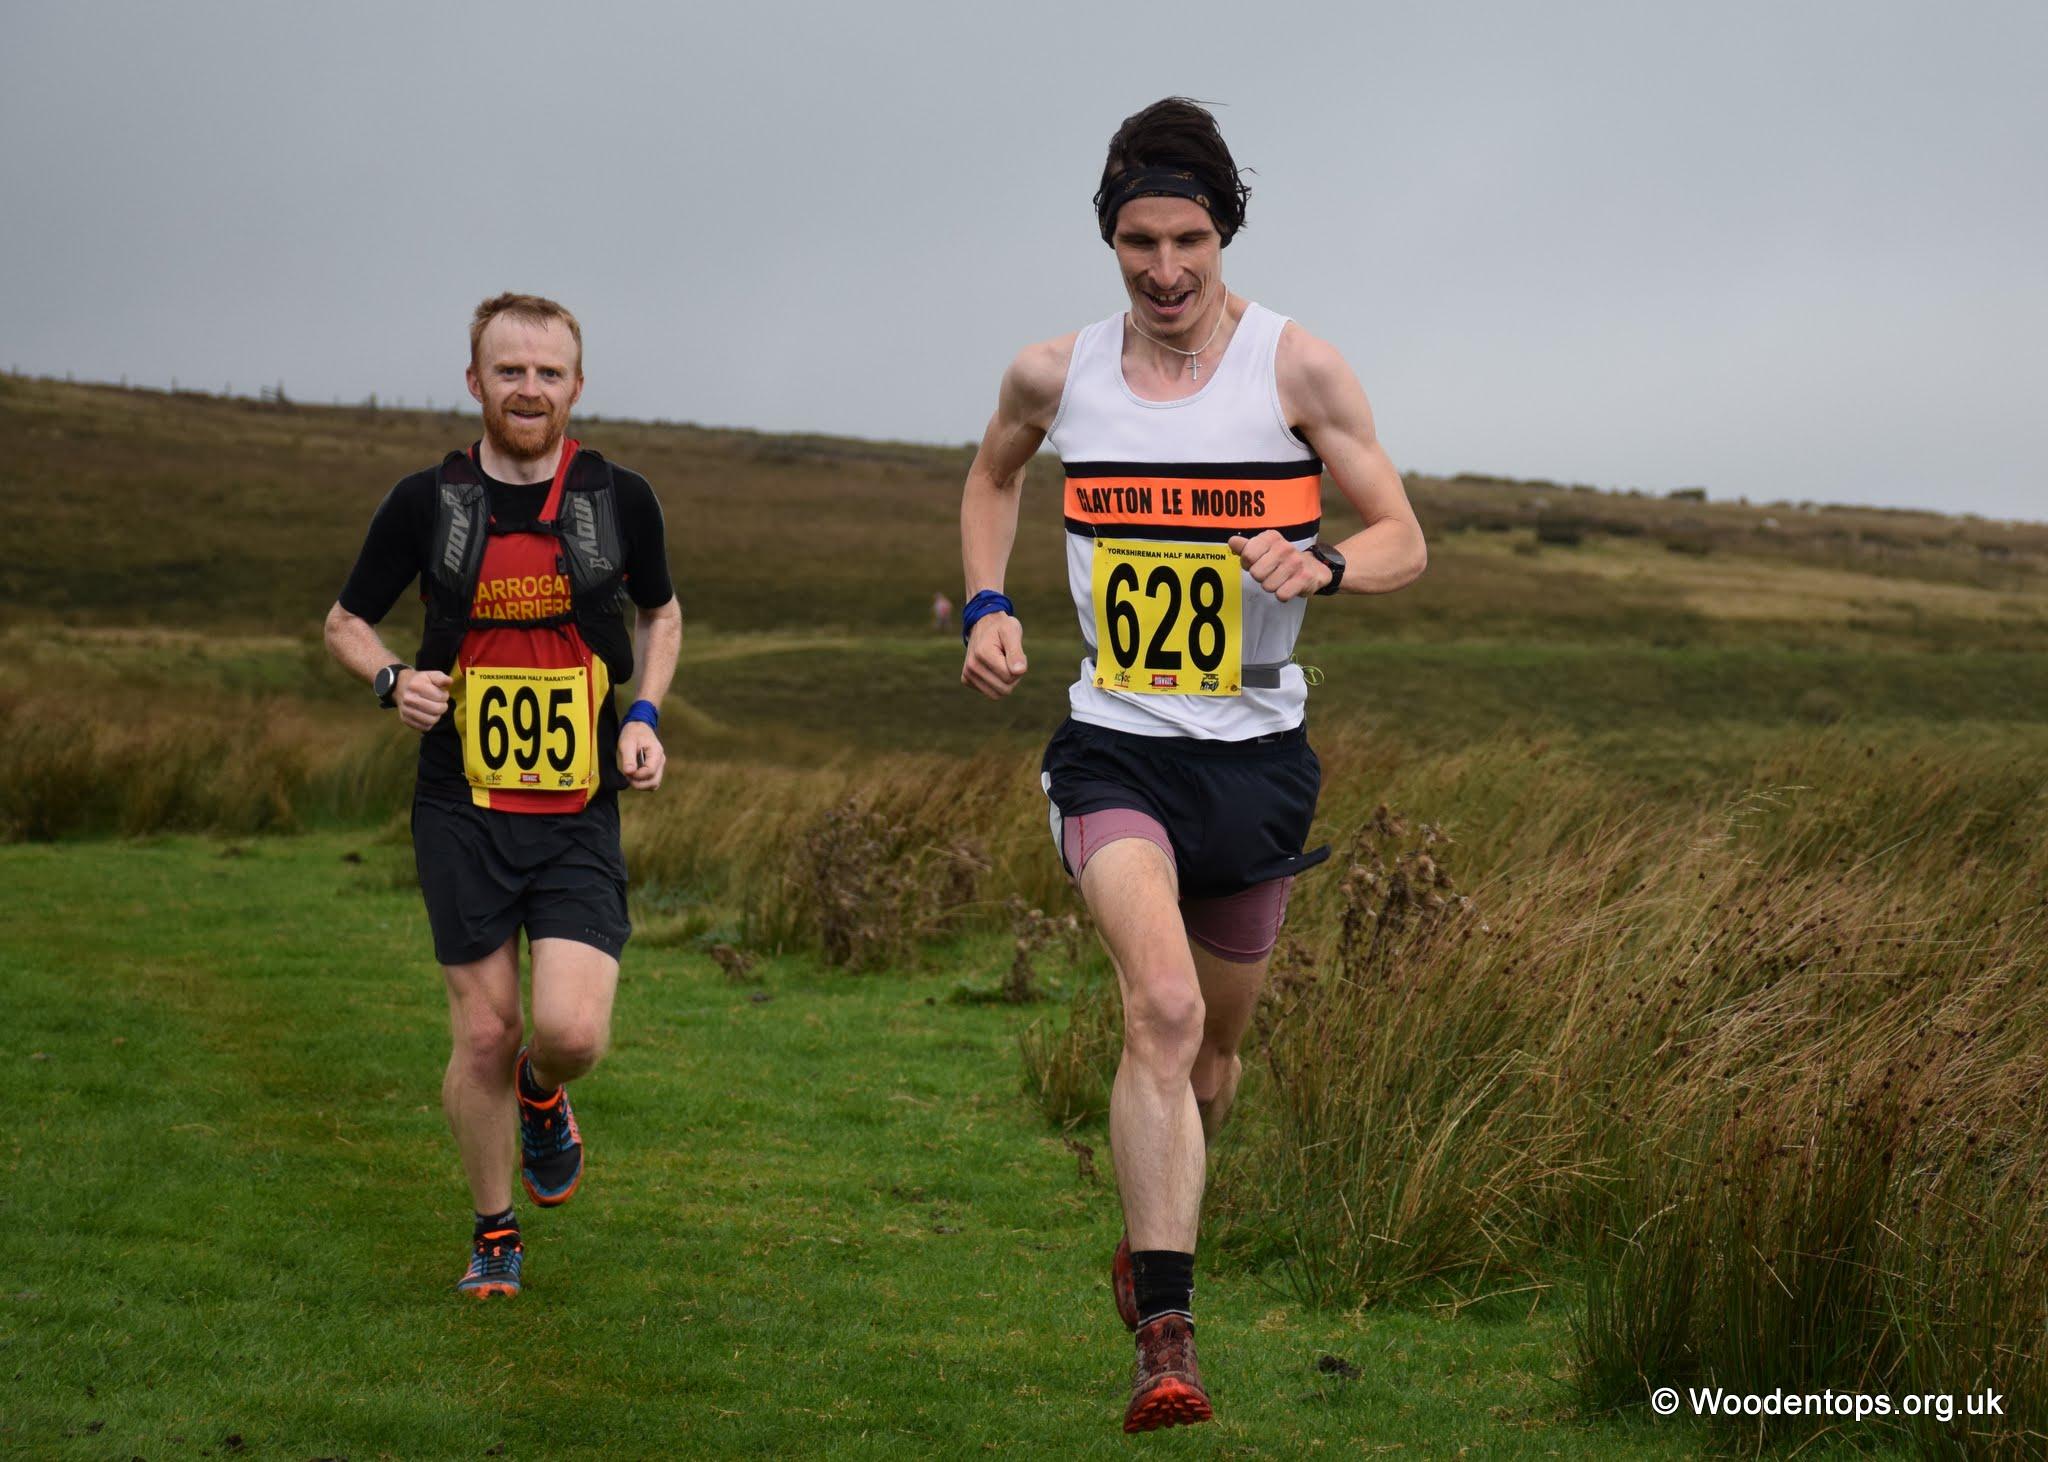 Christopher Holdsworth at the Yorkshireman Half Marathon. Photo by Woodentops